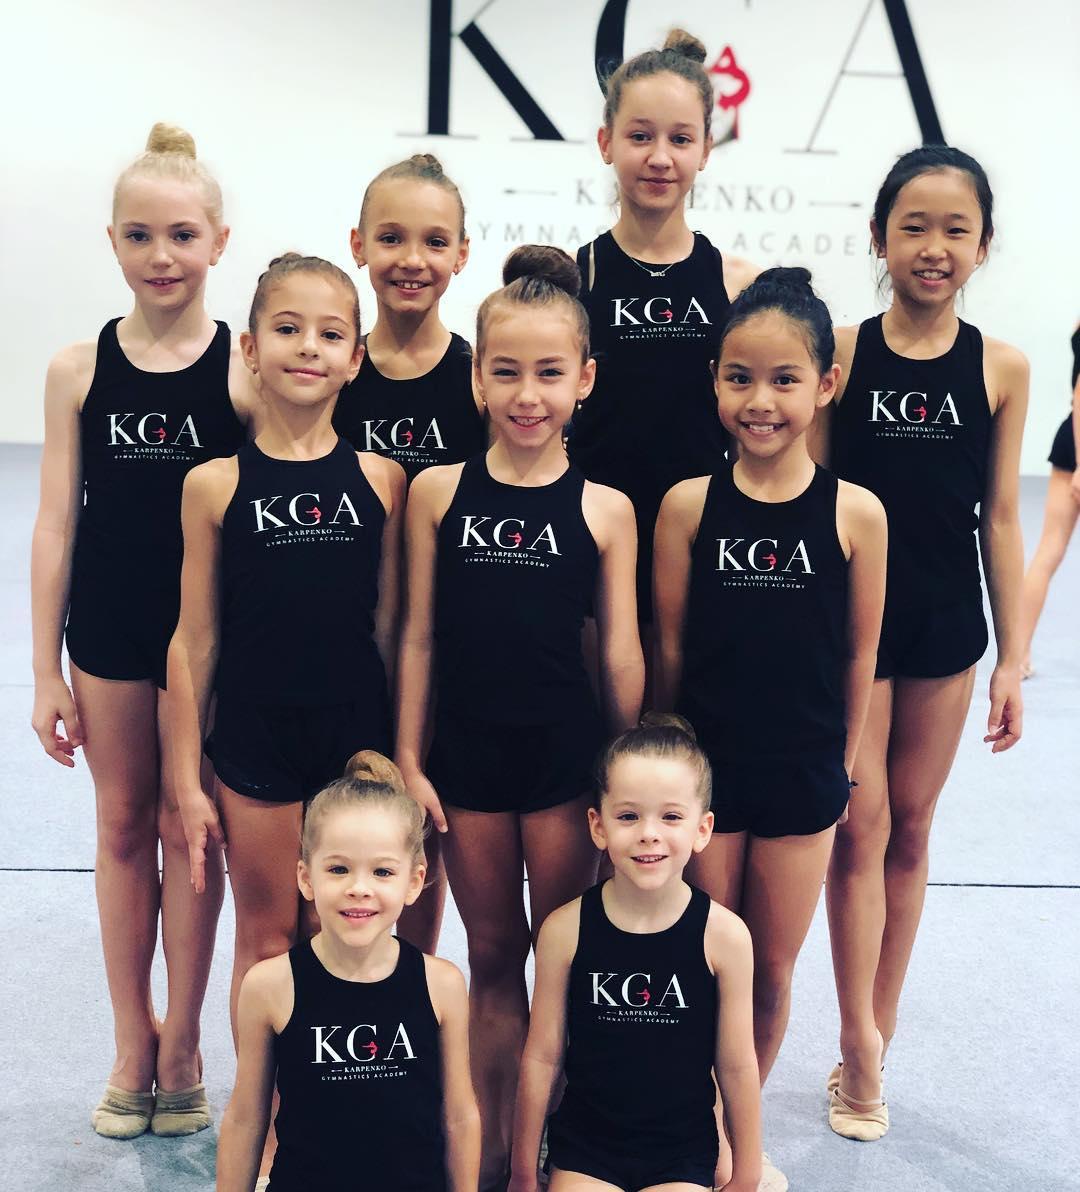 KGA Gym Girls